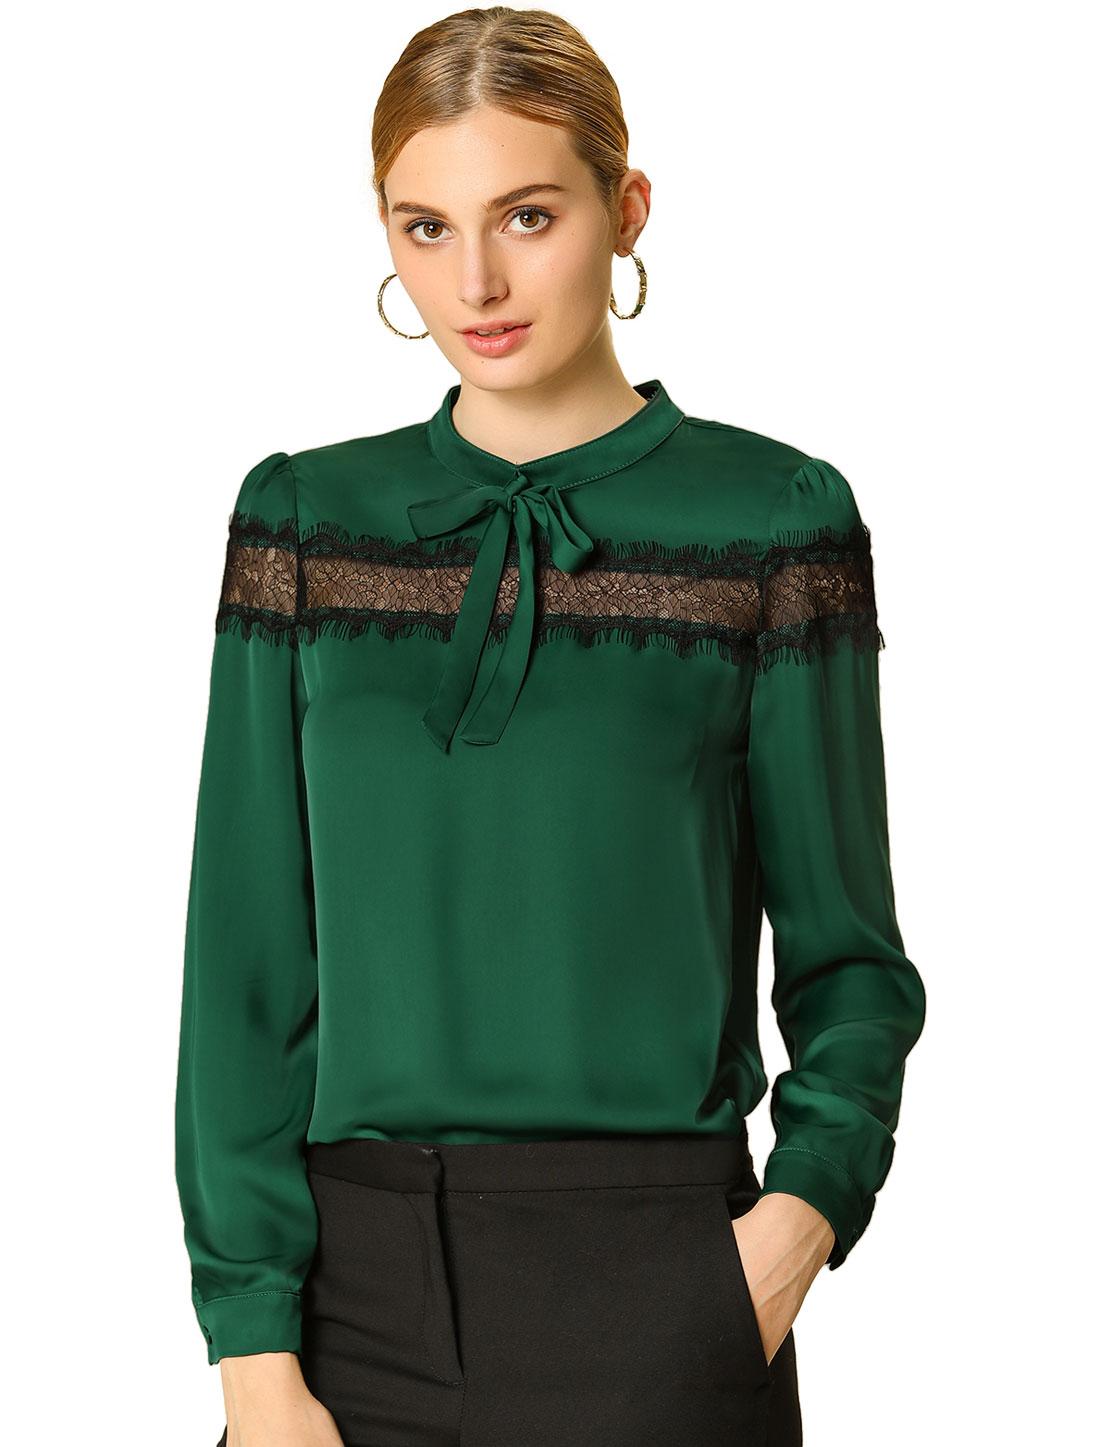 Allegra K Women's Elegant Long Sleeve Tie Neck Shirt Lace Patchwork Top Green XL